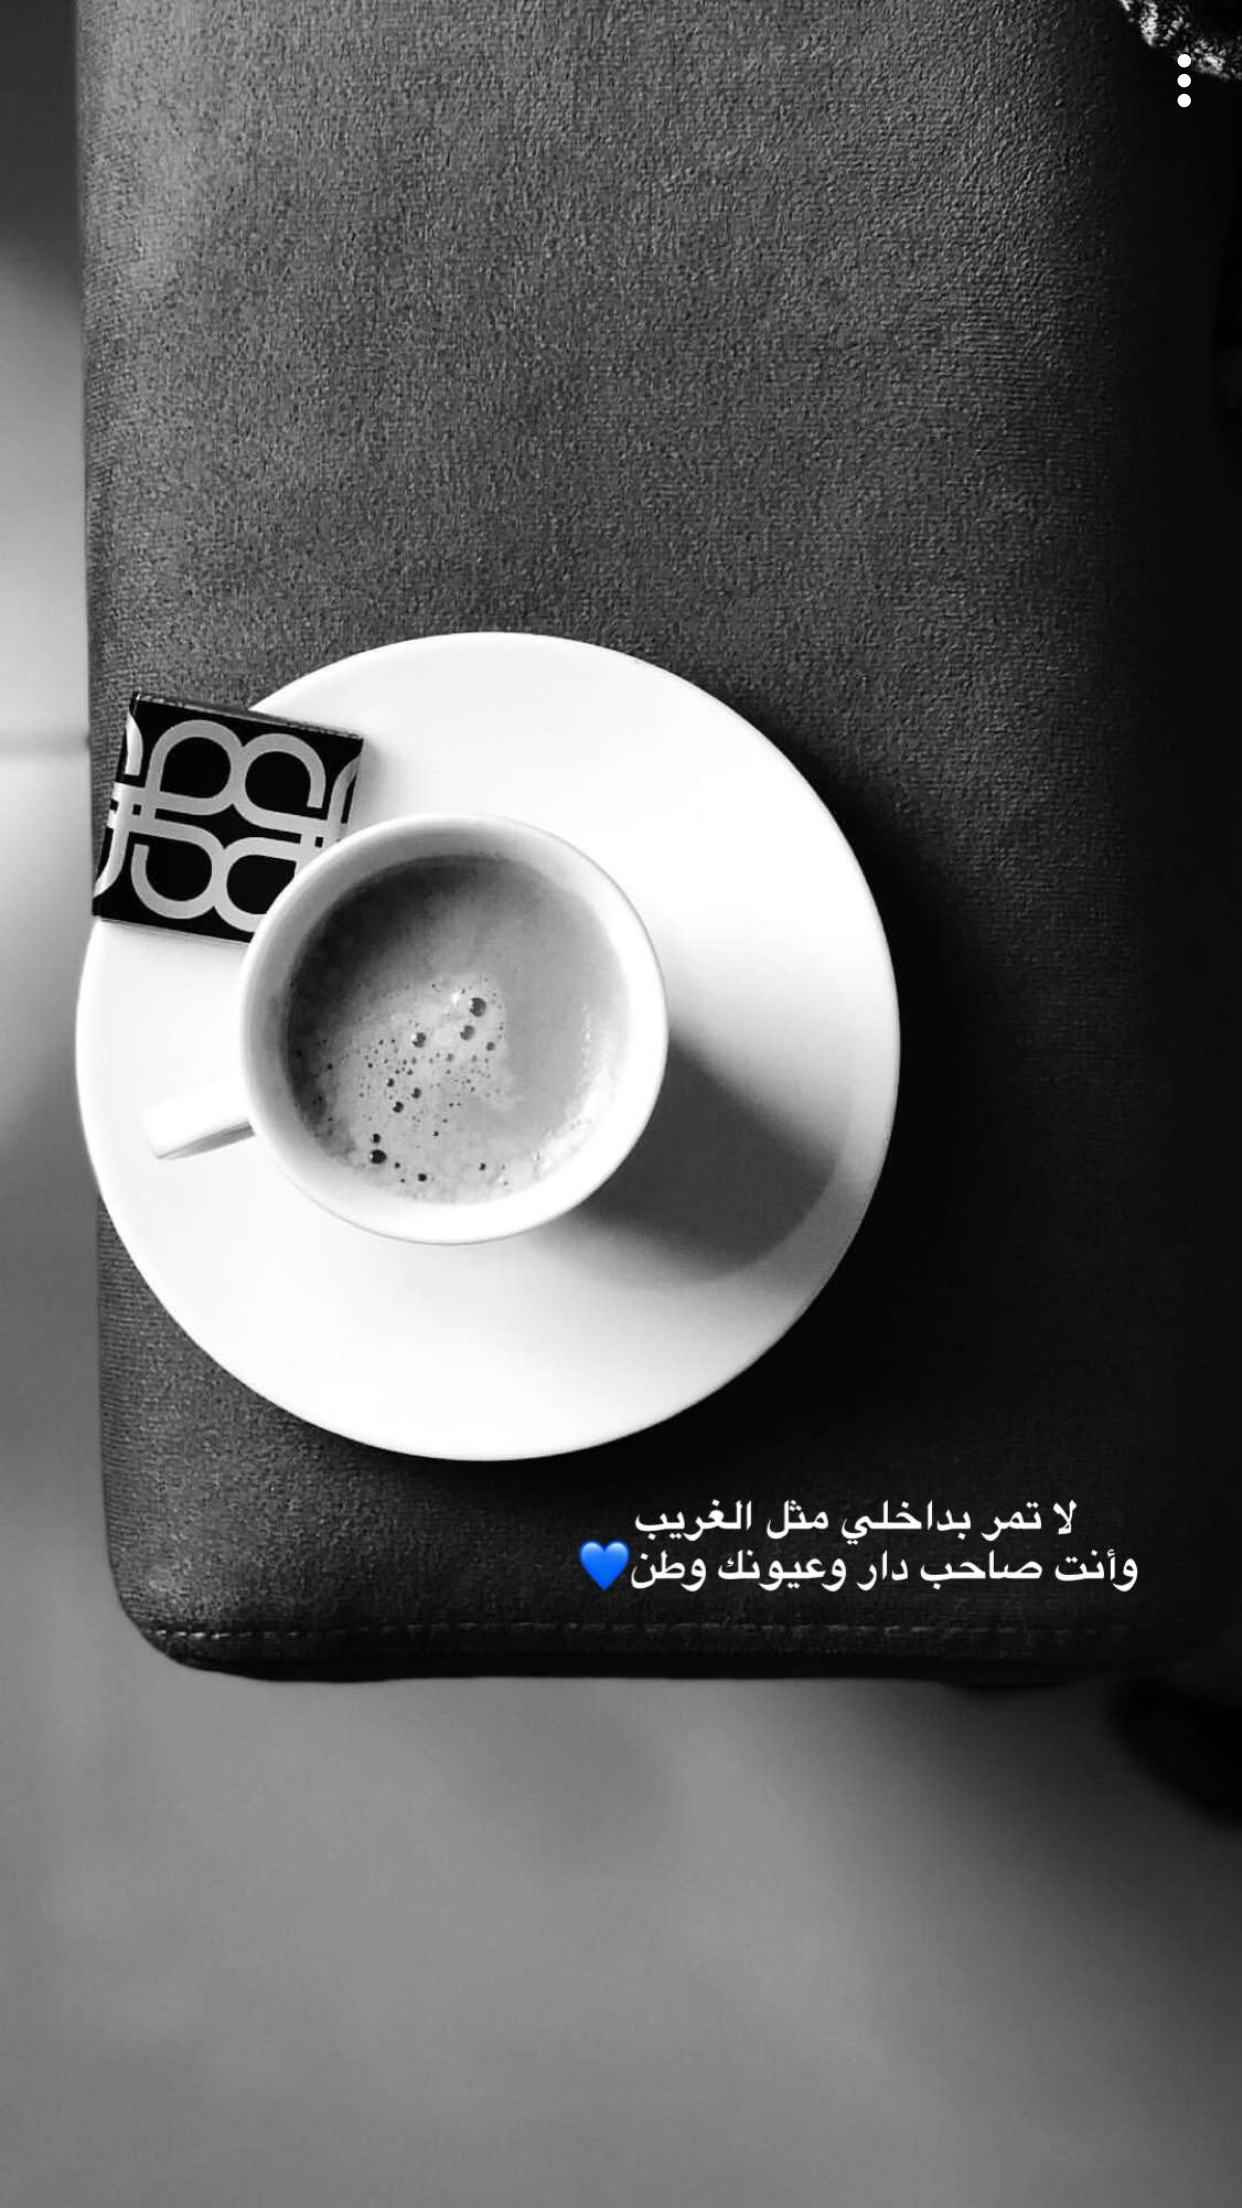 Pin By Noni Noni On شعر Coffee Love Quotes Islamic Love Quotes English Love Quotes